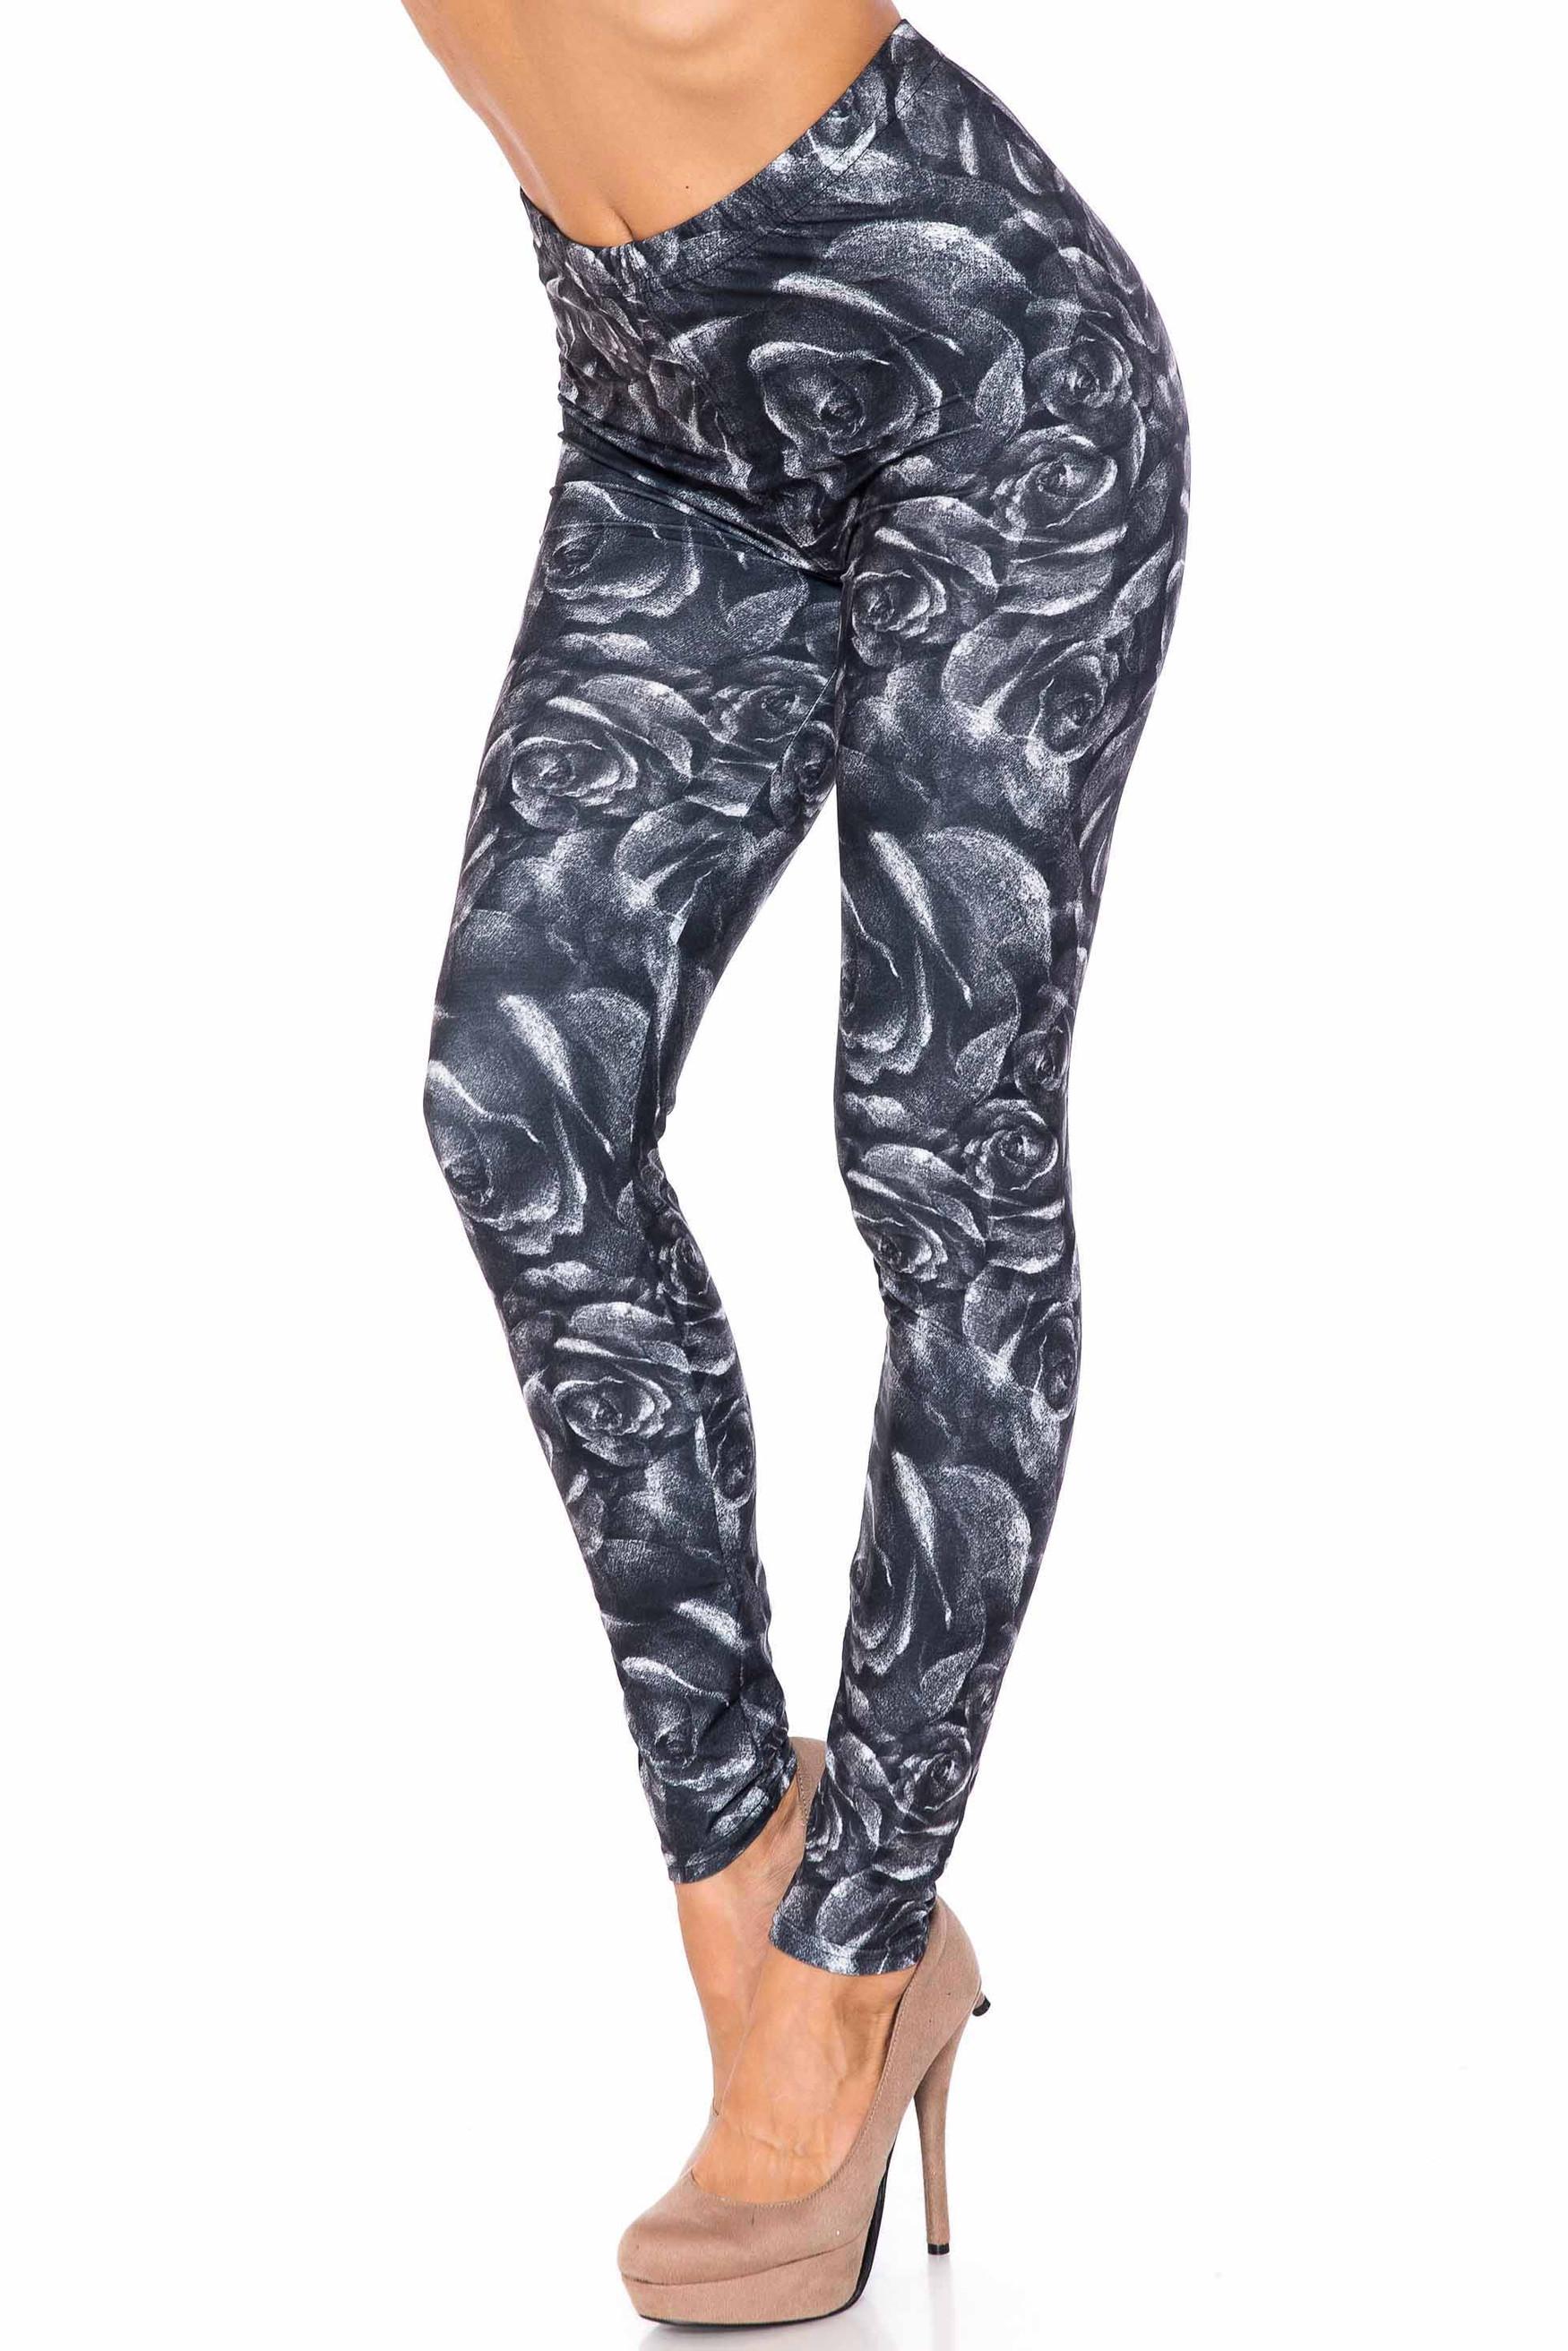 Creamy Soft Monochrome Rose Floral Extra Plus Size Leggings - 3X-5X - USA Fashion™